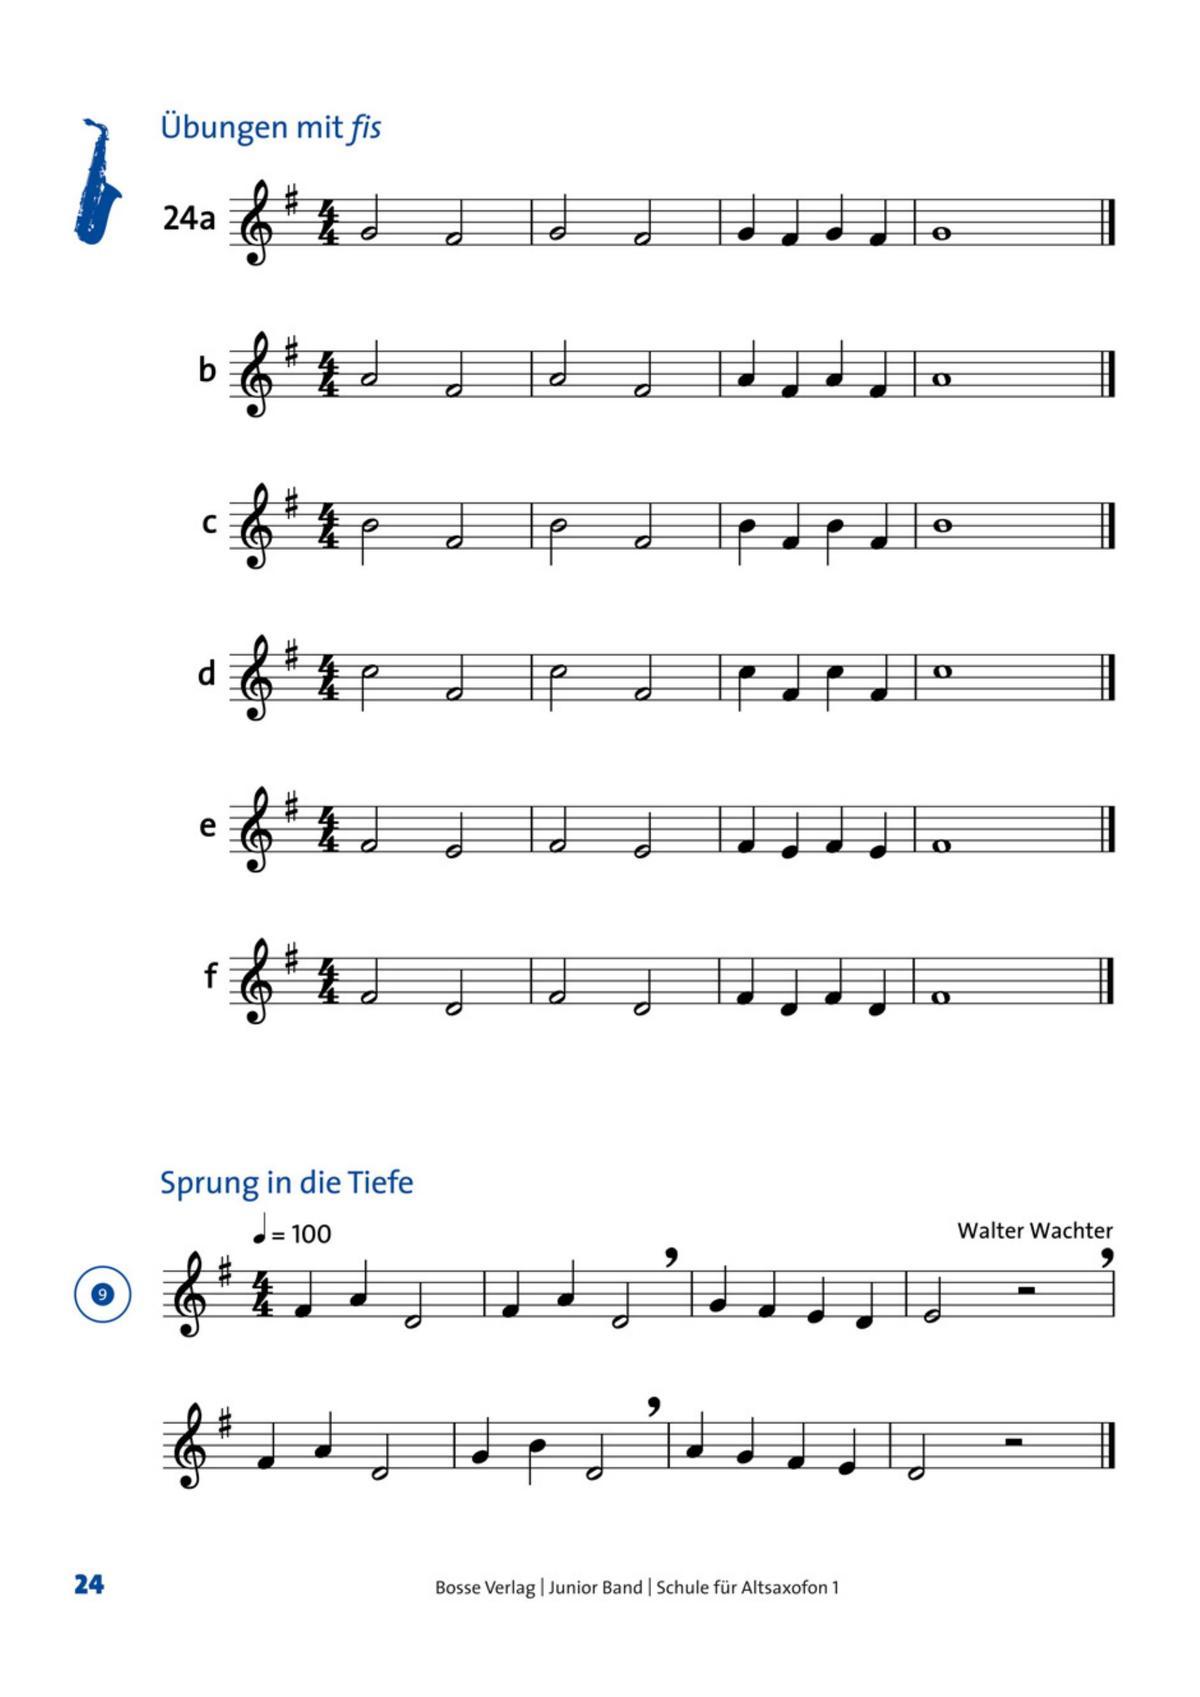 los Saxophon Gummi Tasten Riser Holzblasinstrument Daumen FingerTPI 3 teile